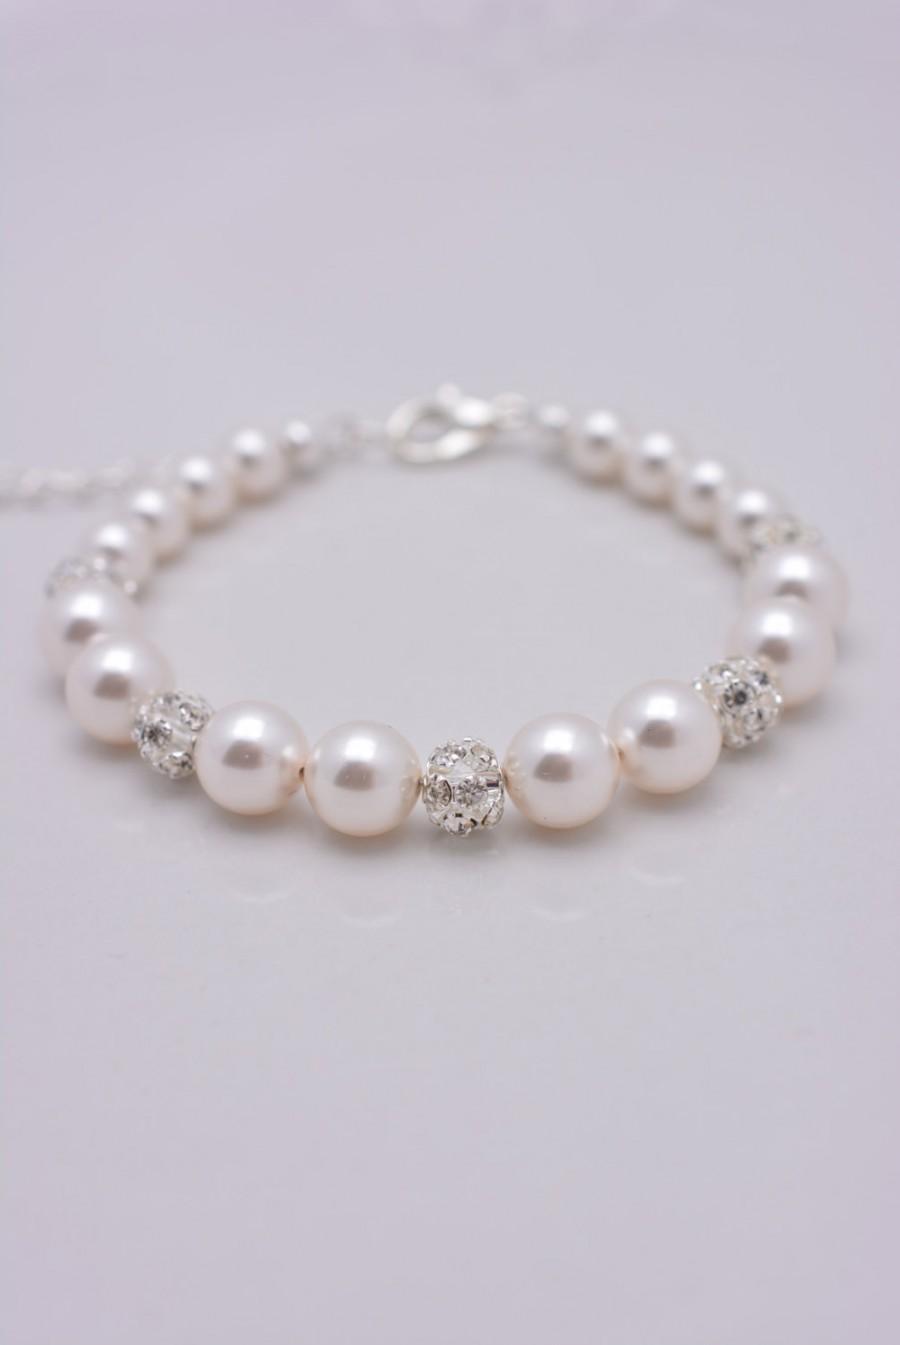 Hochzeit - Pearl and Rhinestone Bracelet Wedding Bracelet, Pearl Bridal Bracelet, Swarovski Pearl Bracelet, Adjustable Bridesmaid Pearl Bracelet 0210